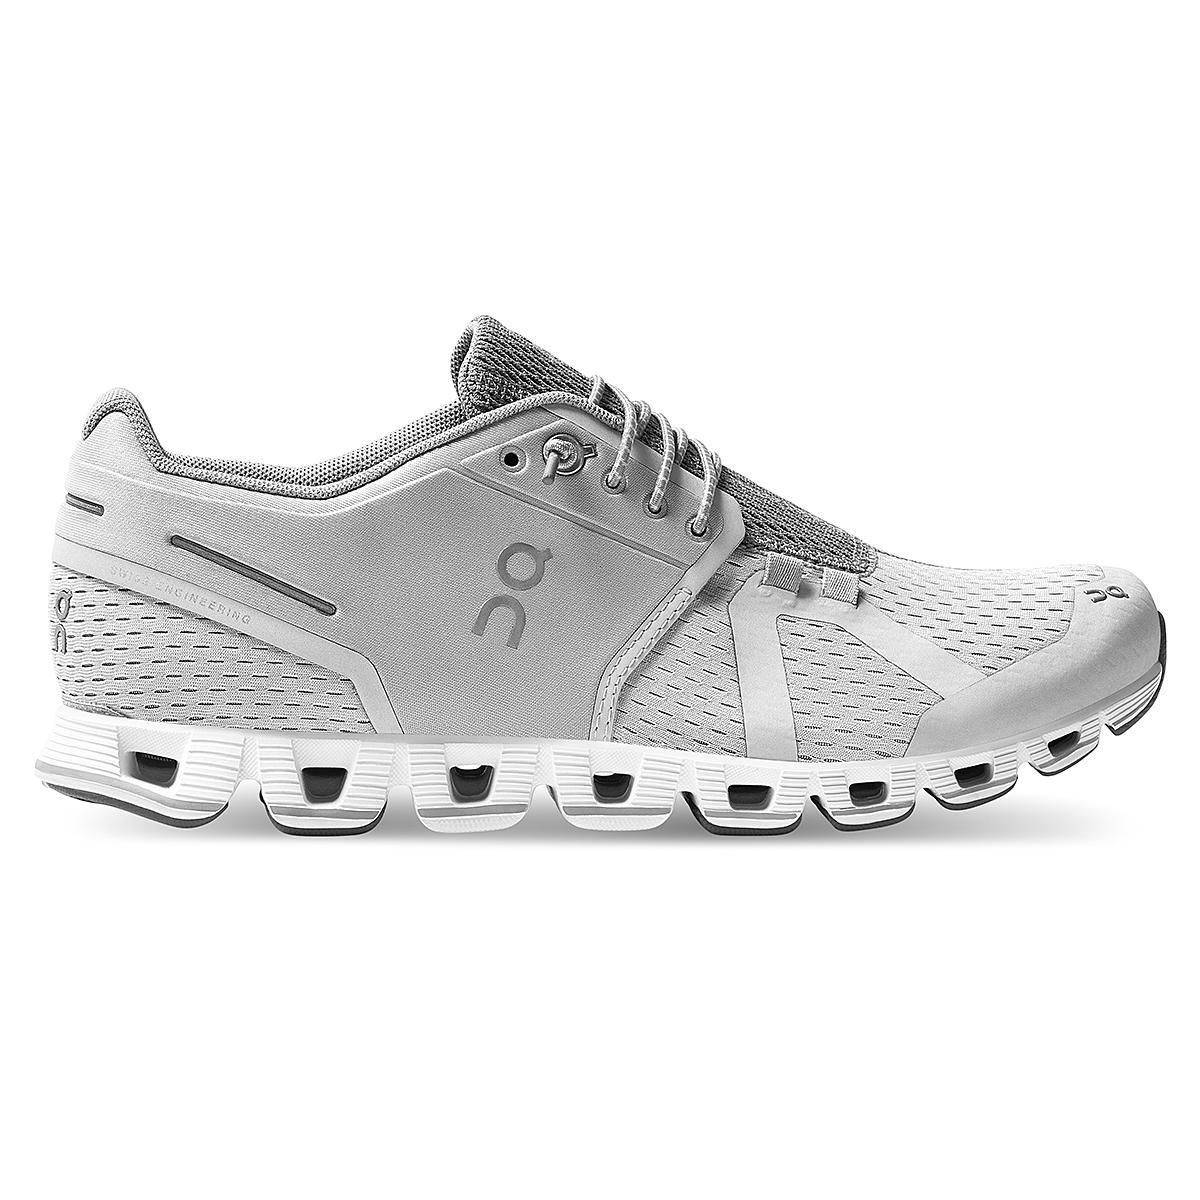 Women's On Cloud Running Shoe - Color: Glacier/White - Size: 5 - Width: Regular, Glacier/White, large, image 1